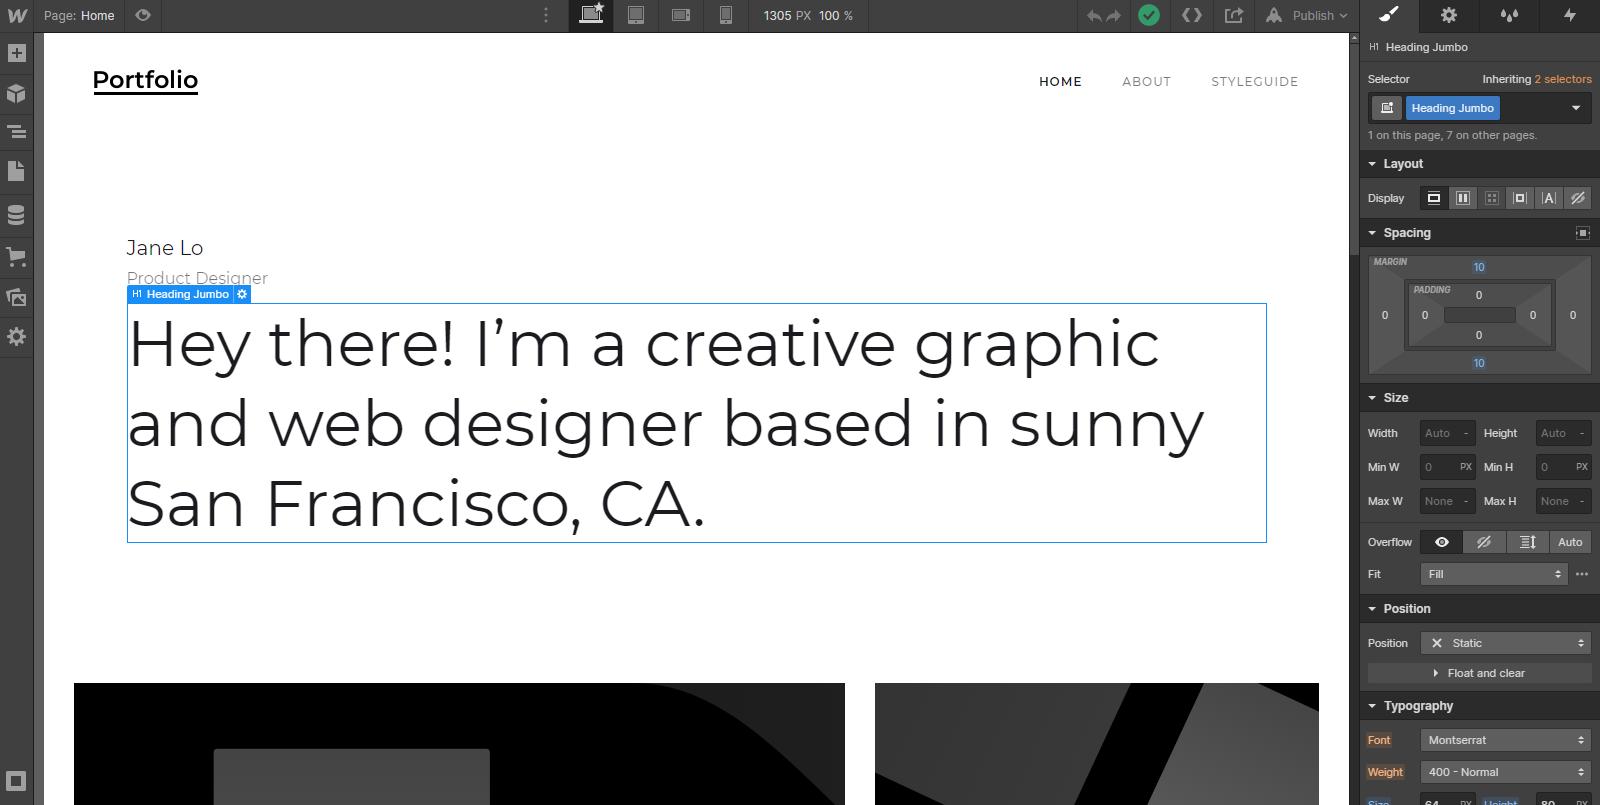 Webflow designer tool